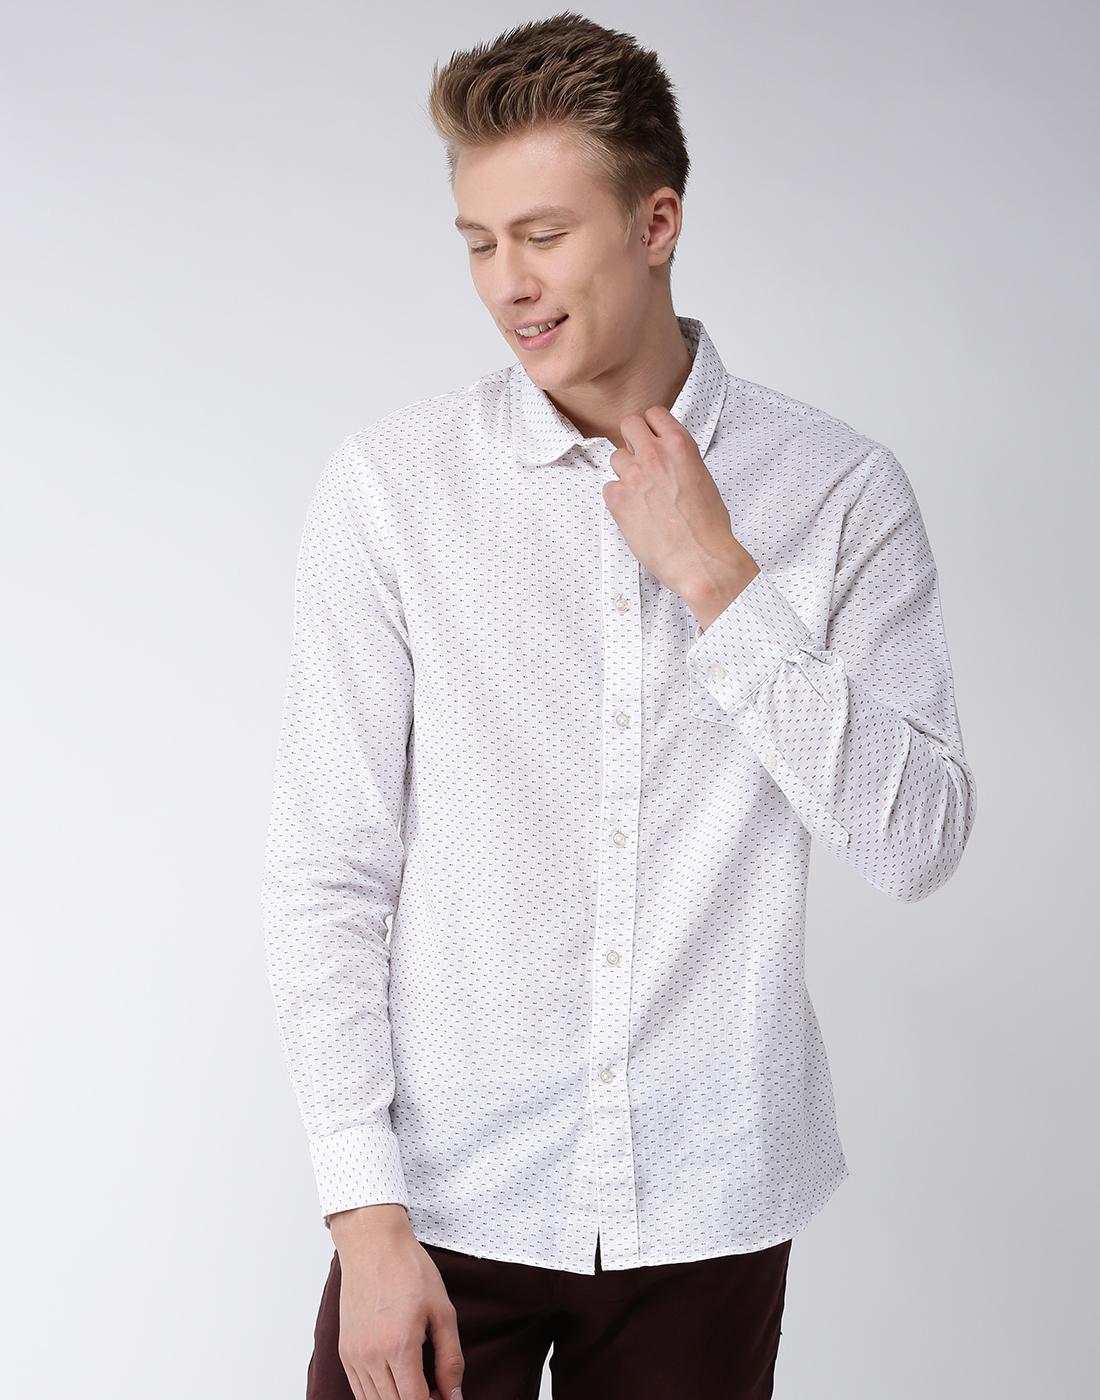 celio | Linen White Casual Shirts